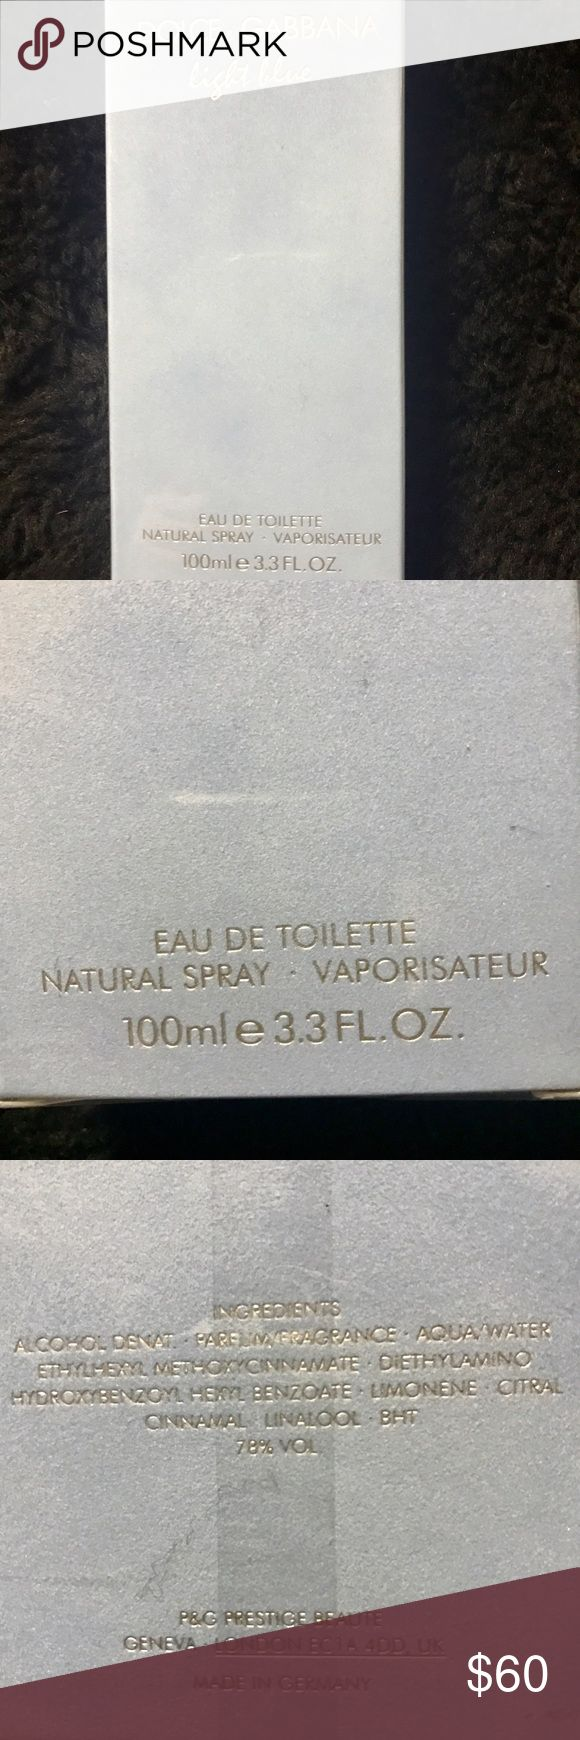 "Brand New Perfume by D&G""Light Blue"" Sealed 3.3 Oz Authentic Dolce&Gabbana Eau De Toilette Natural Spray-Vaporisateur for Women ""Light Blue"" 100ml /3.3 Oz Dolce & Gabbana Other"